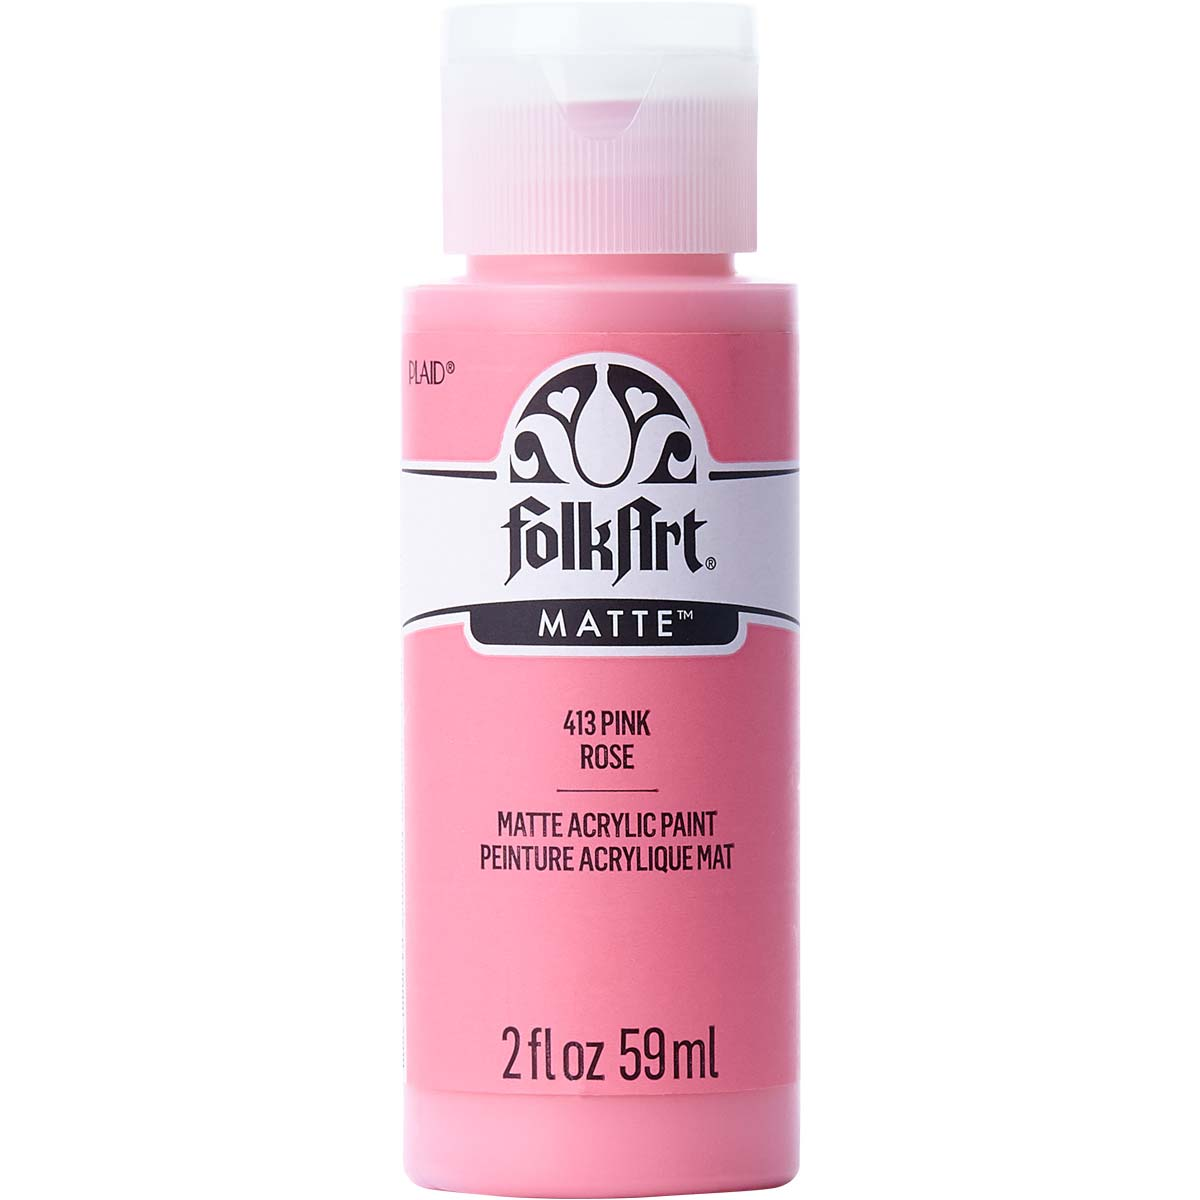 FolkArt ® Acrylic Colors - Pink, 2 oz. - 413